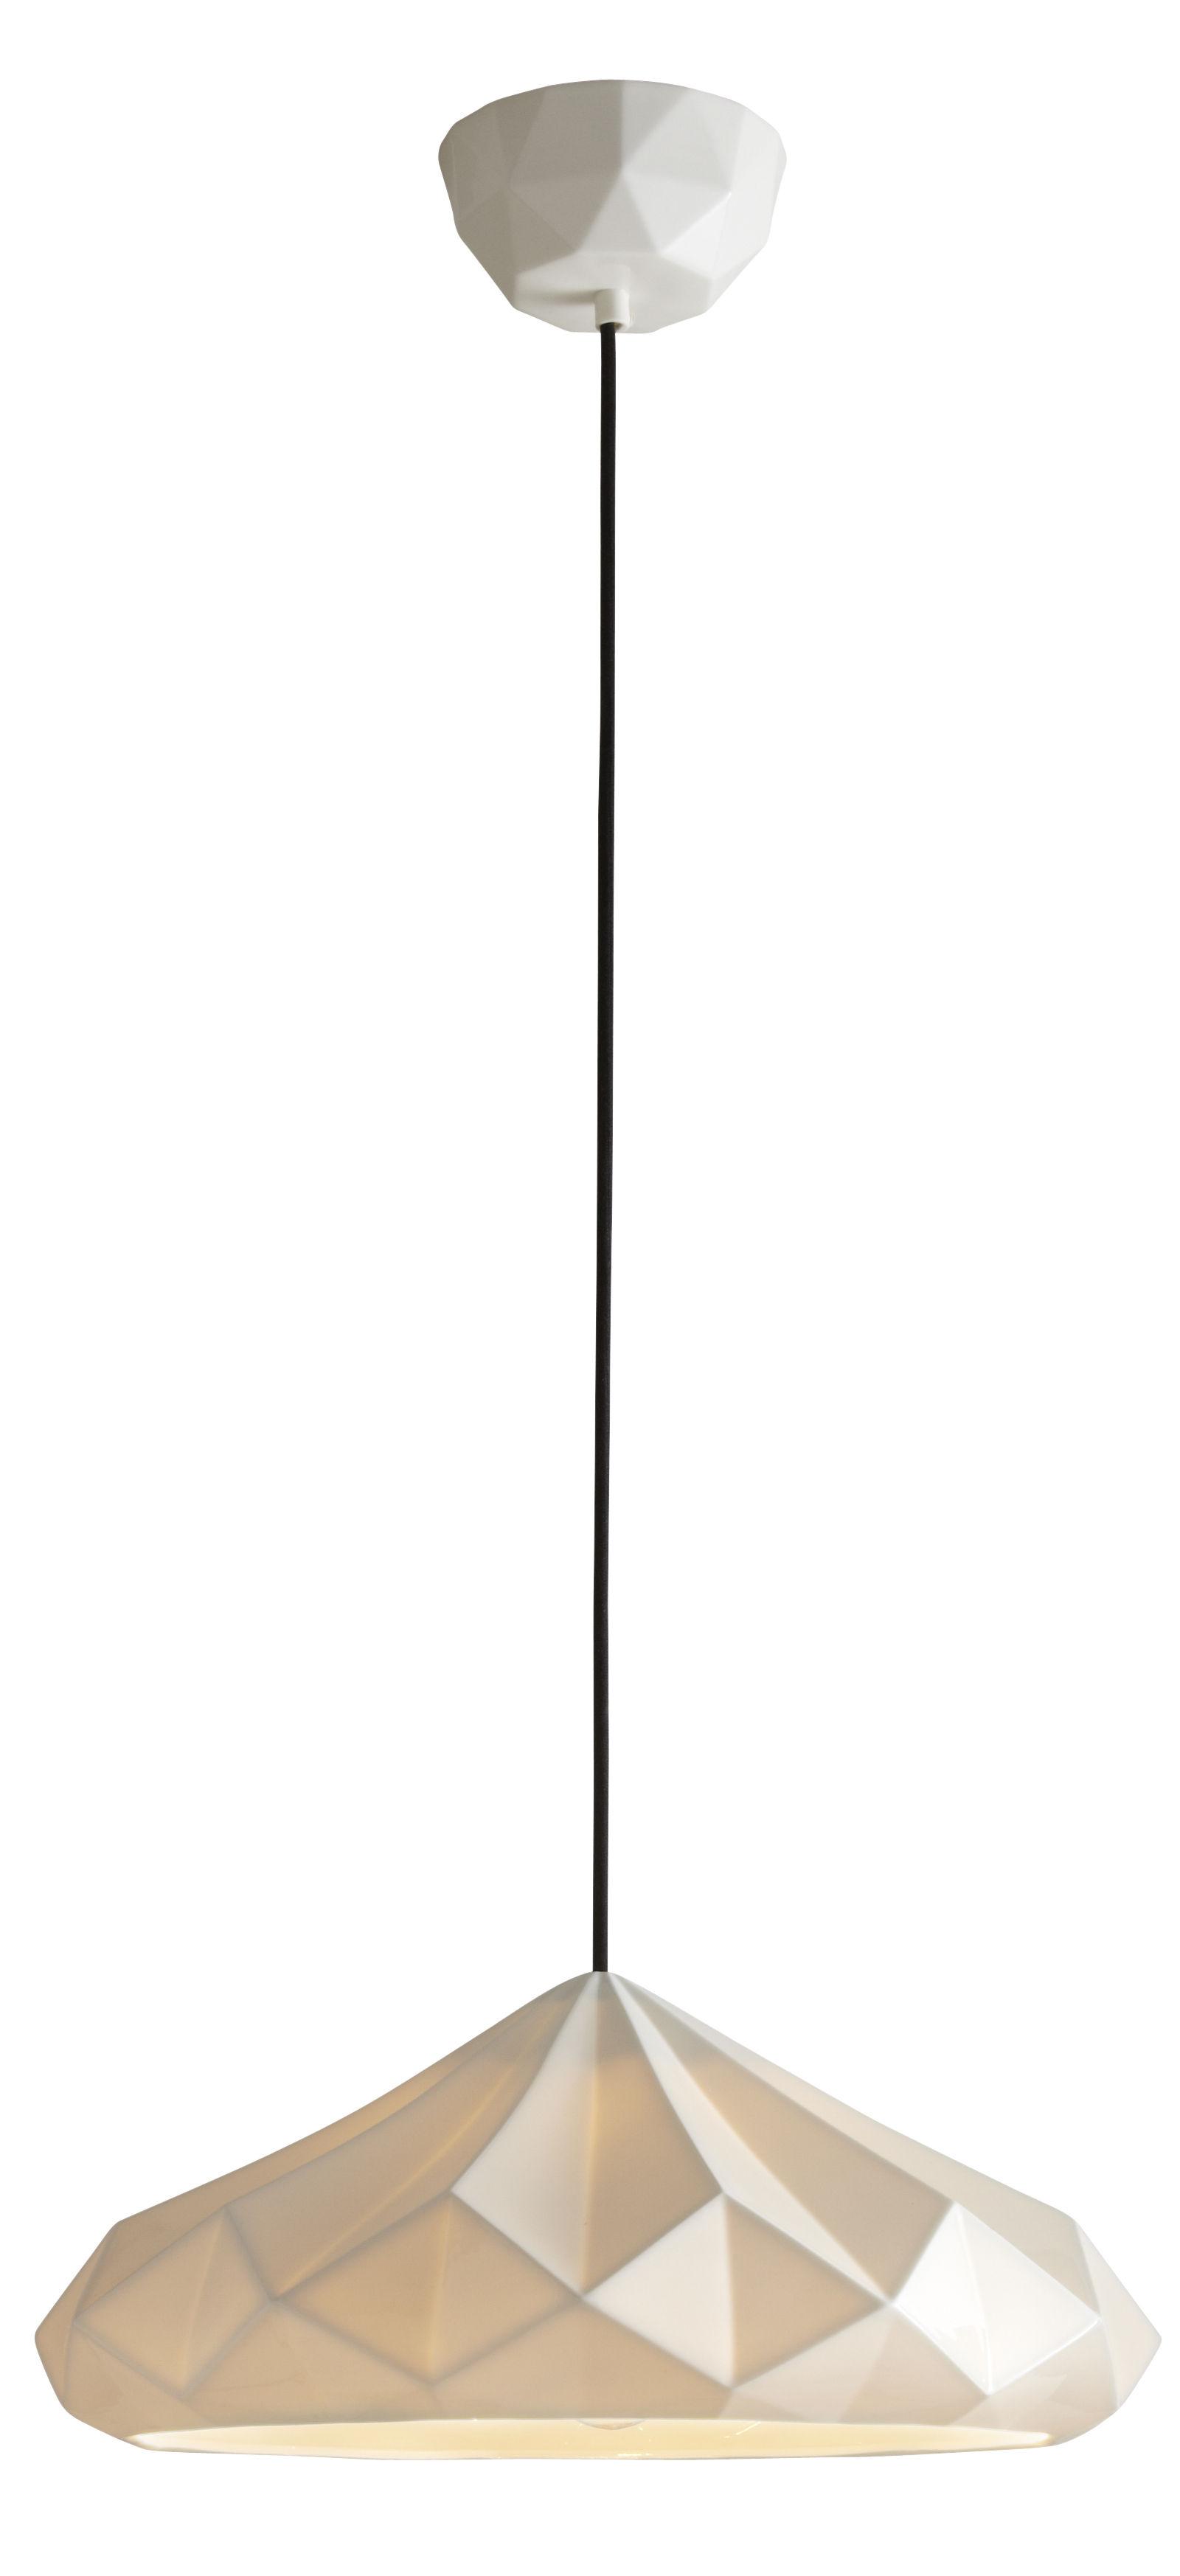 Illuminazione - Lampadari - Sospensione Hatton 4 - / Ø 41,5 x H 18 cm - Porcellana di Original BTC - Porcellana bianca - Porcellana